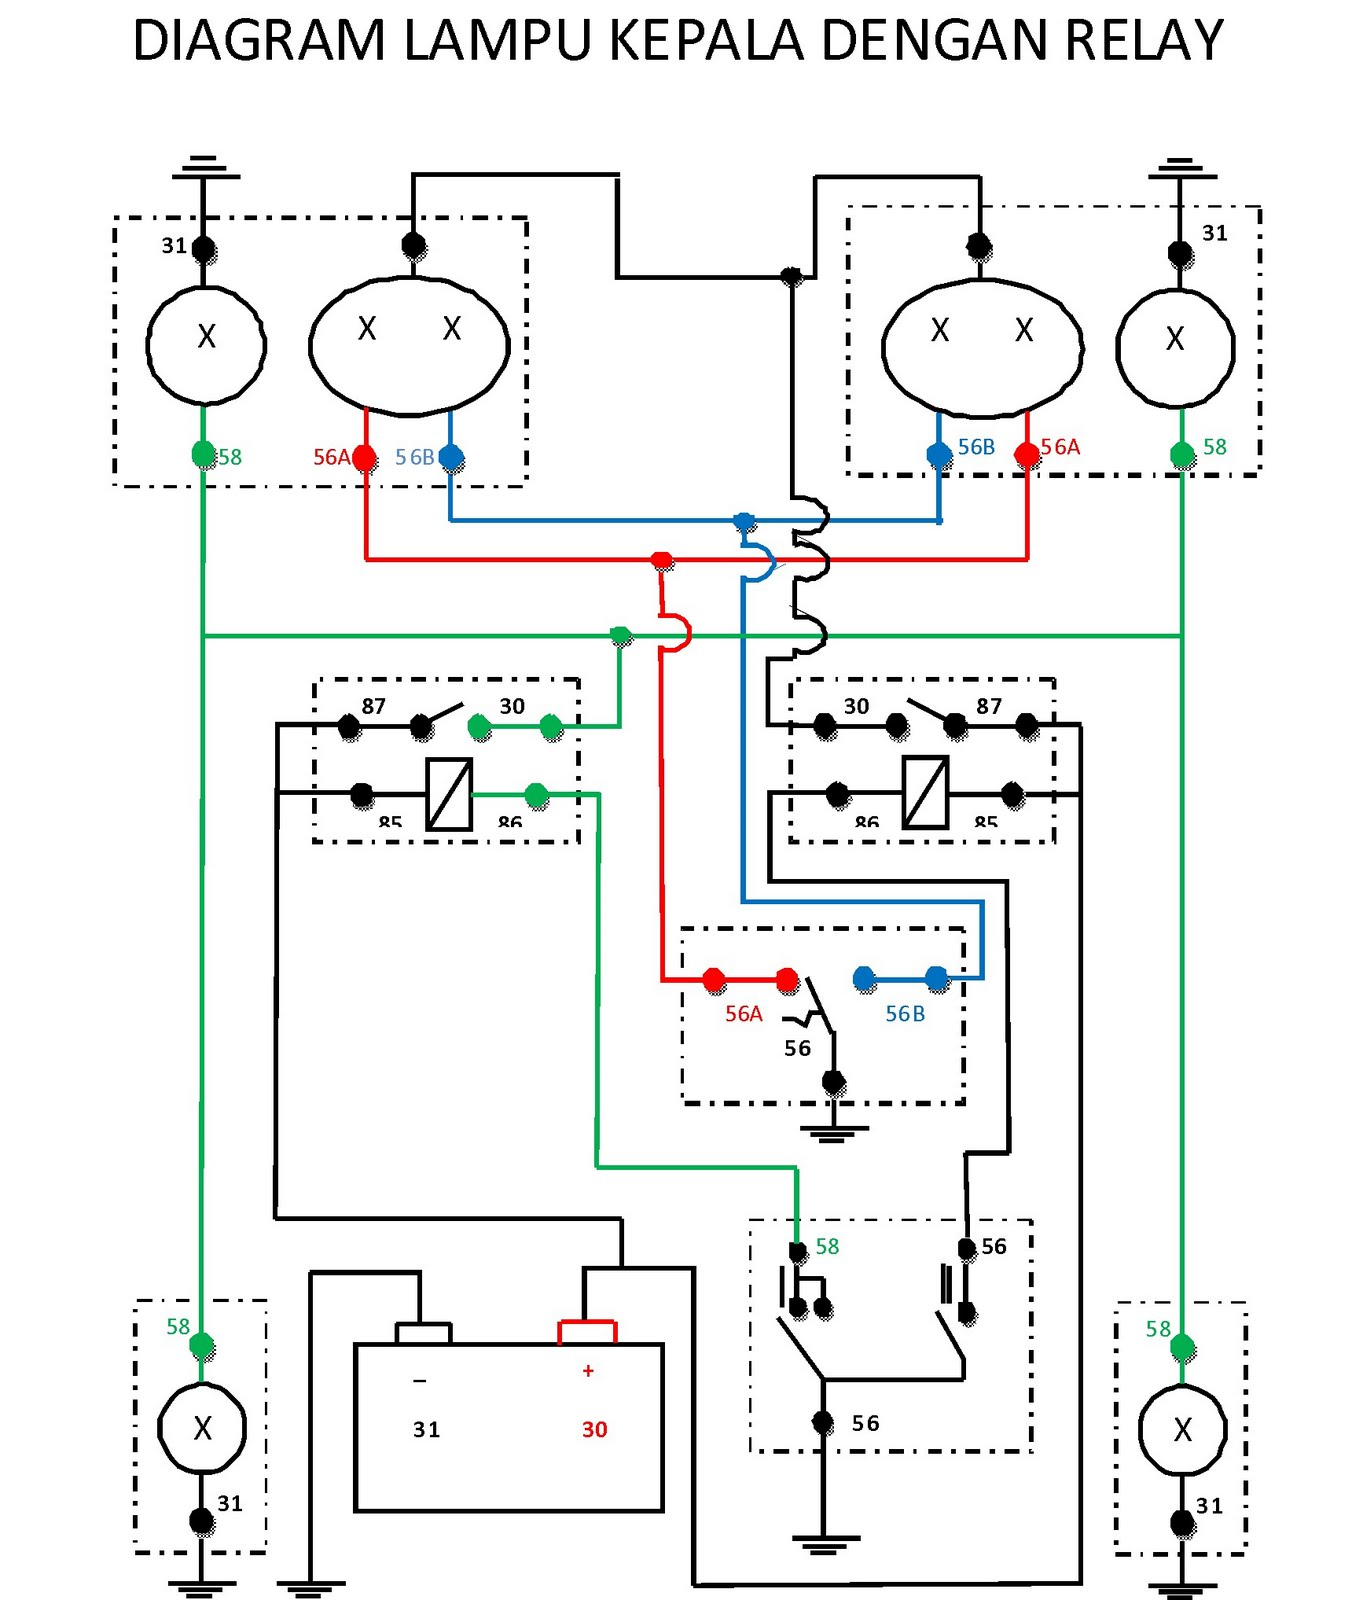 wiring diagram kelistrikan ac mobil free download wiring diagram rh xwiaw us wiring diagram ac mobil xenia RV AC Wiring Diagram